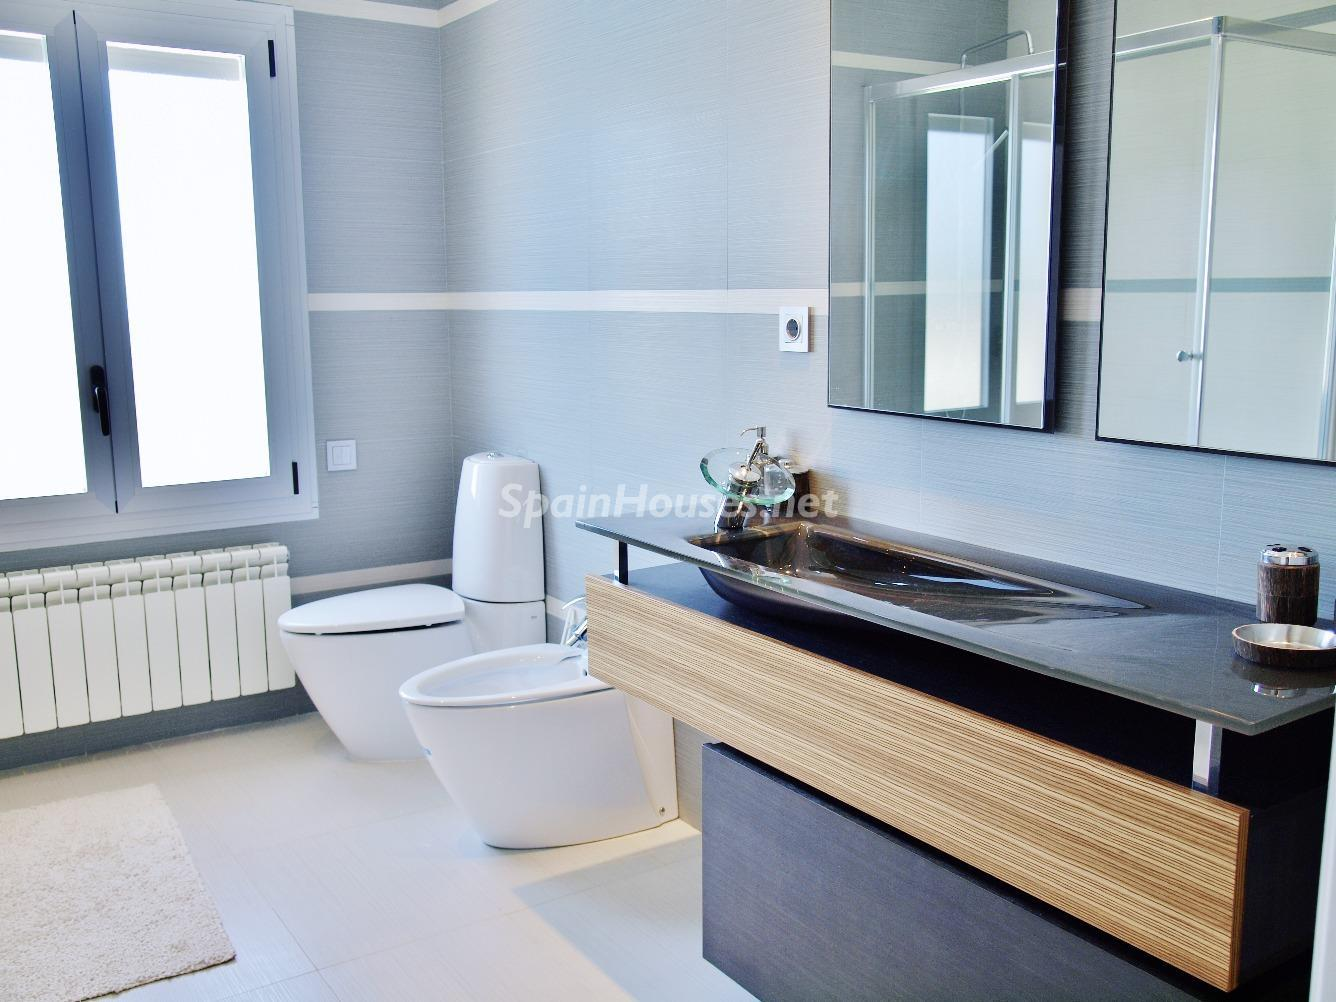 15. House for sale in Las Rozas de Madrid Madrid 1 - Exclusive 7 Bedroom Villa for Sale in Las Rozas de Madrid